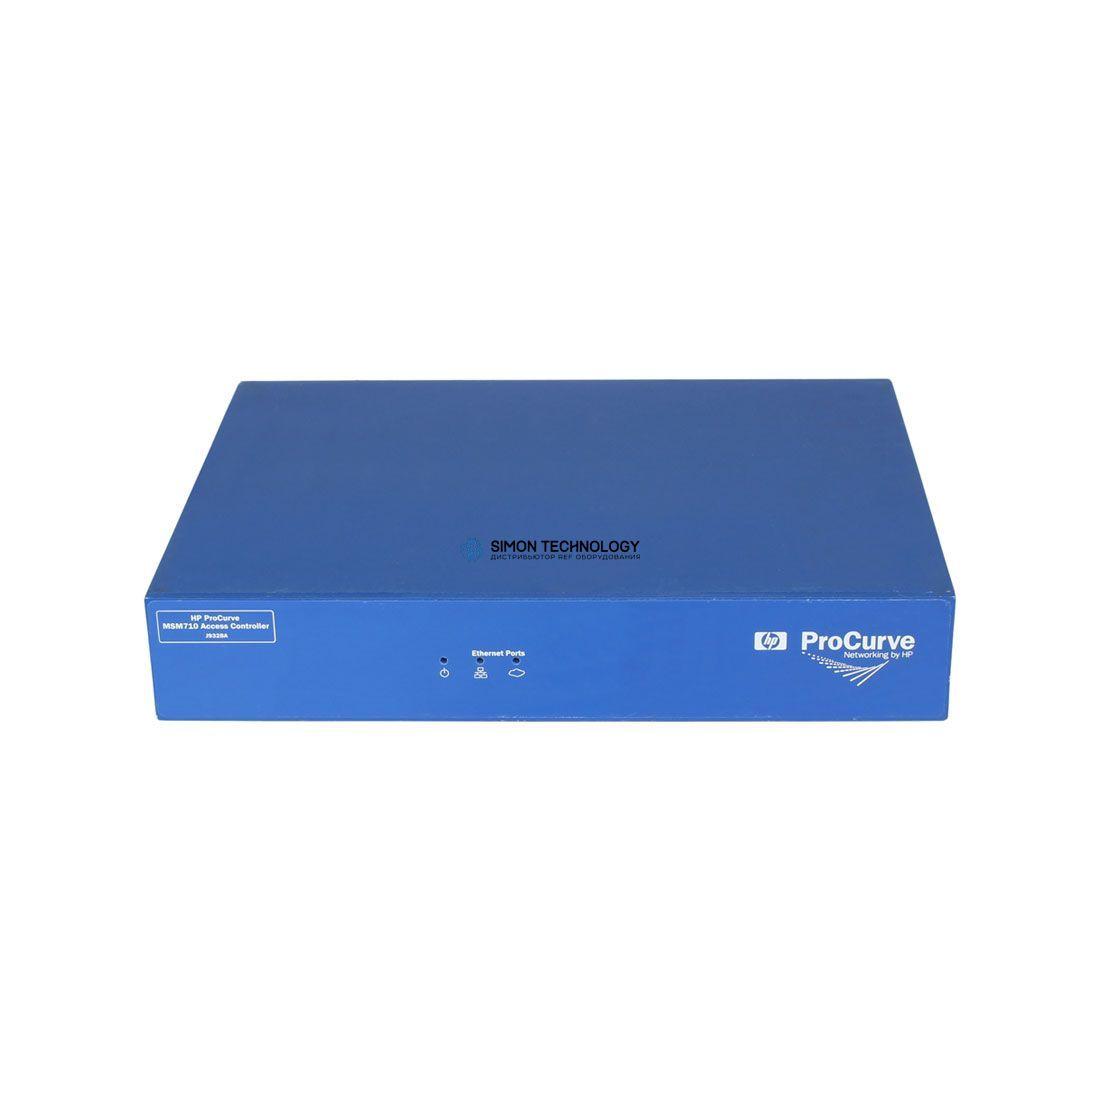 Точка доступа HP PROCURVE MSM710 WIRELESS ACCESS POINT - NO PSU (J9328-69001-0PSU)